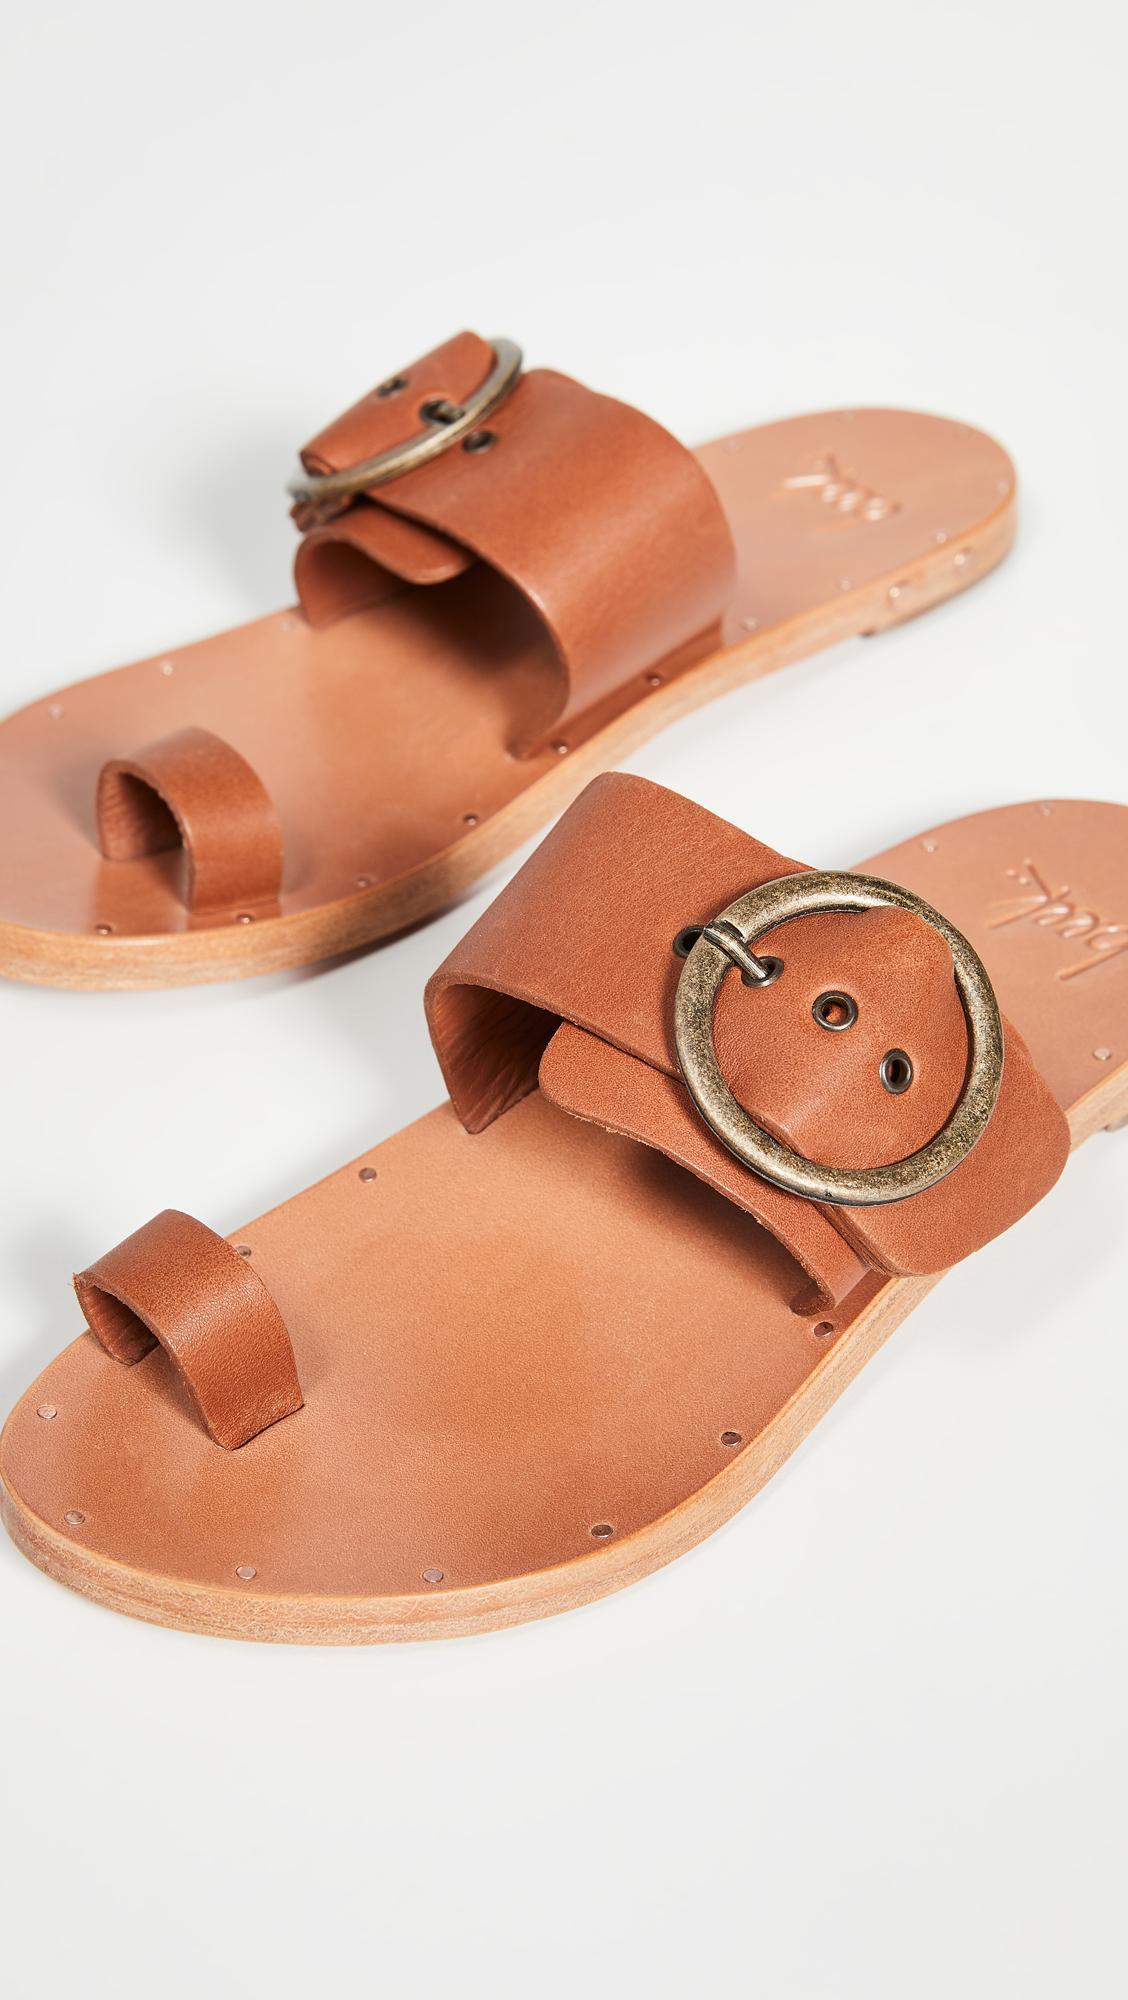 Emily Ratajkowski's Shoes Are Spring's Weirdest Sandal Trend 4